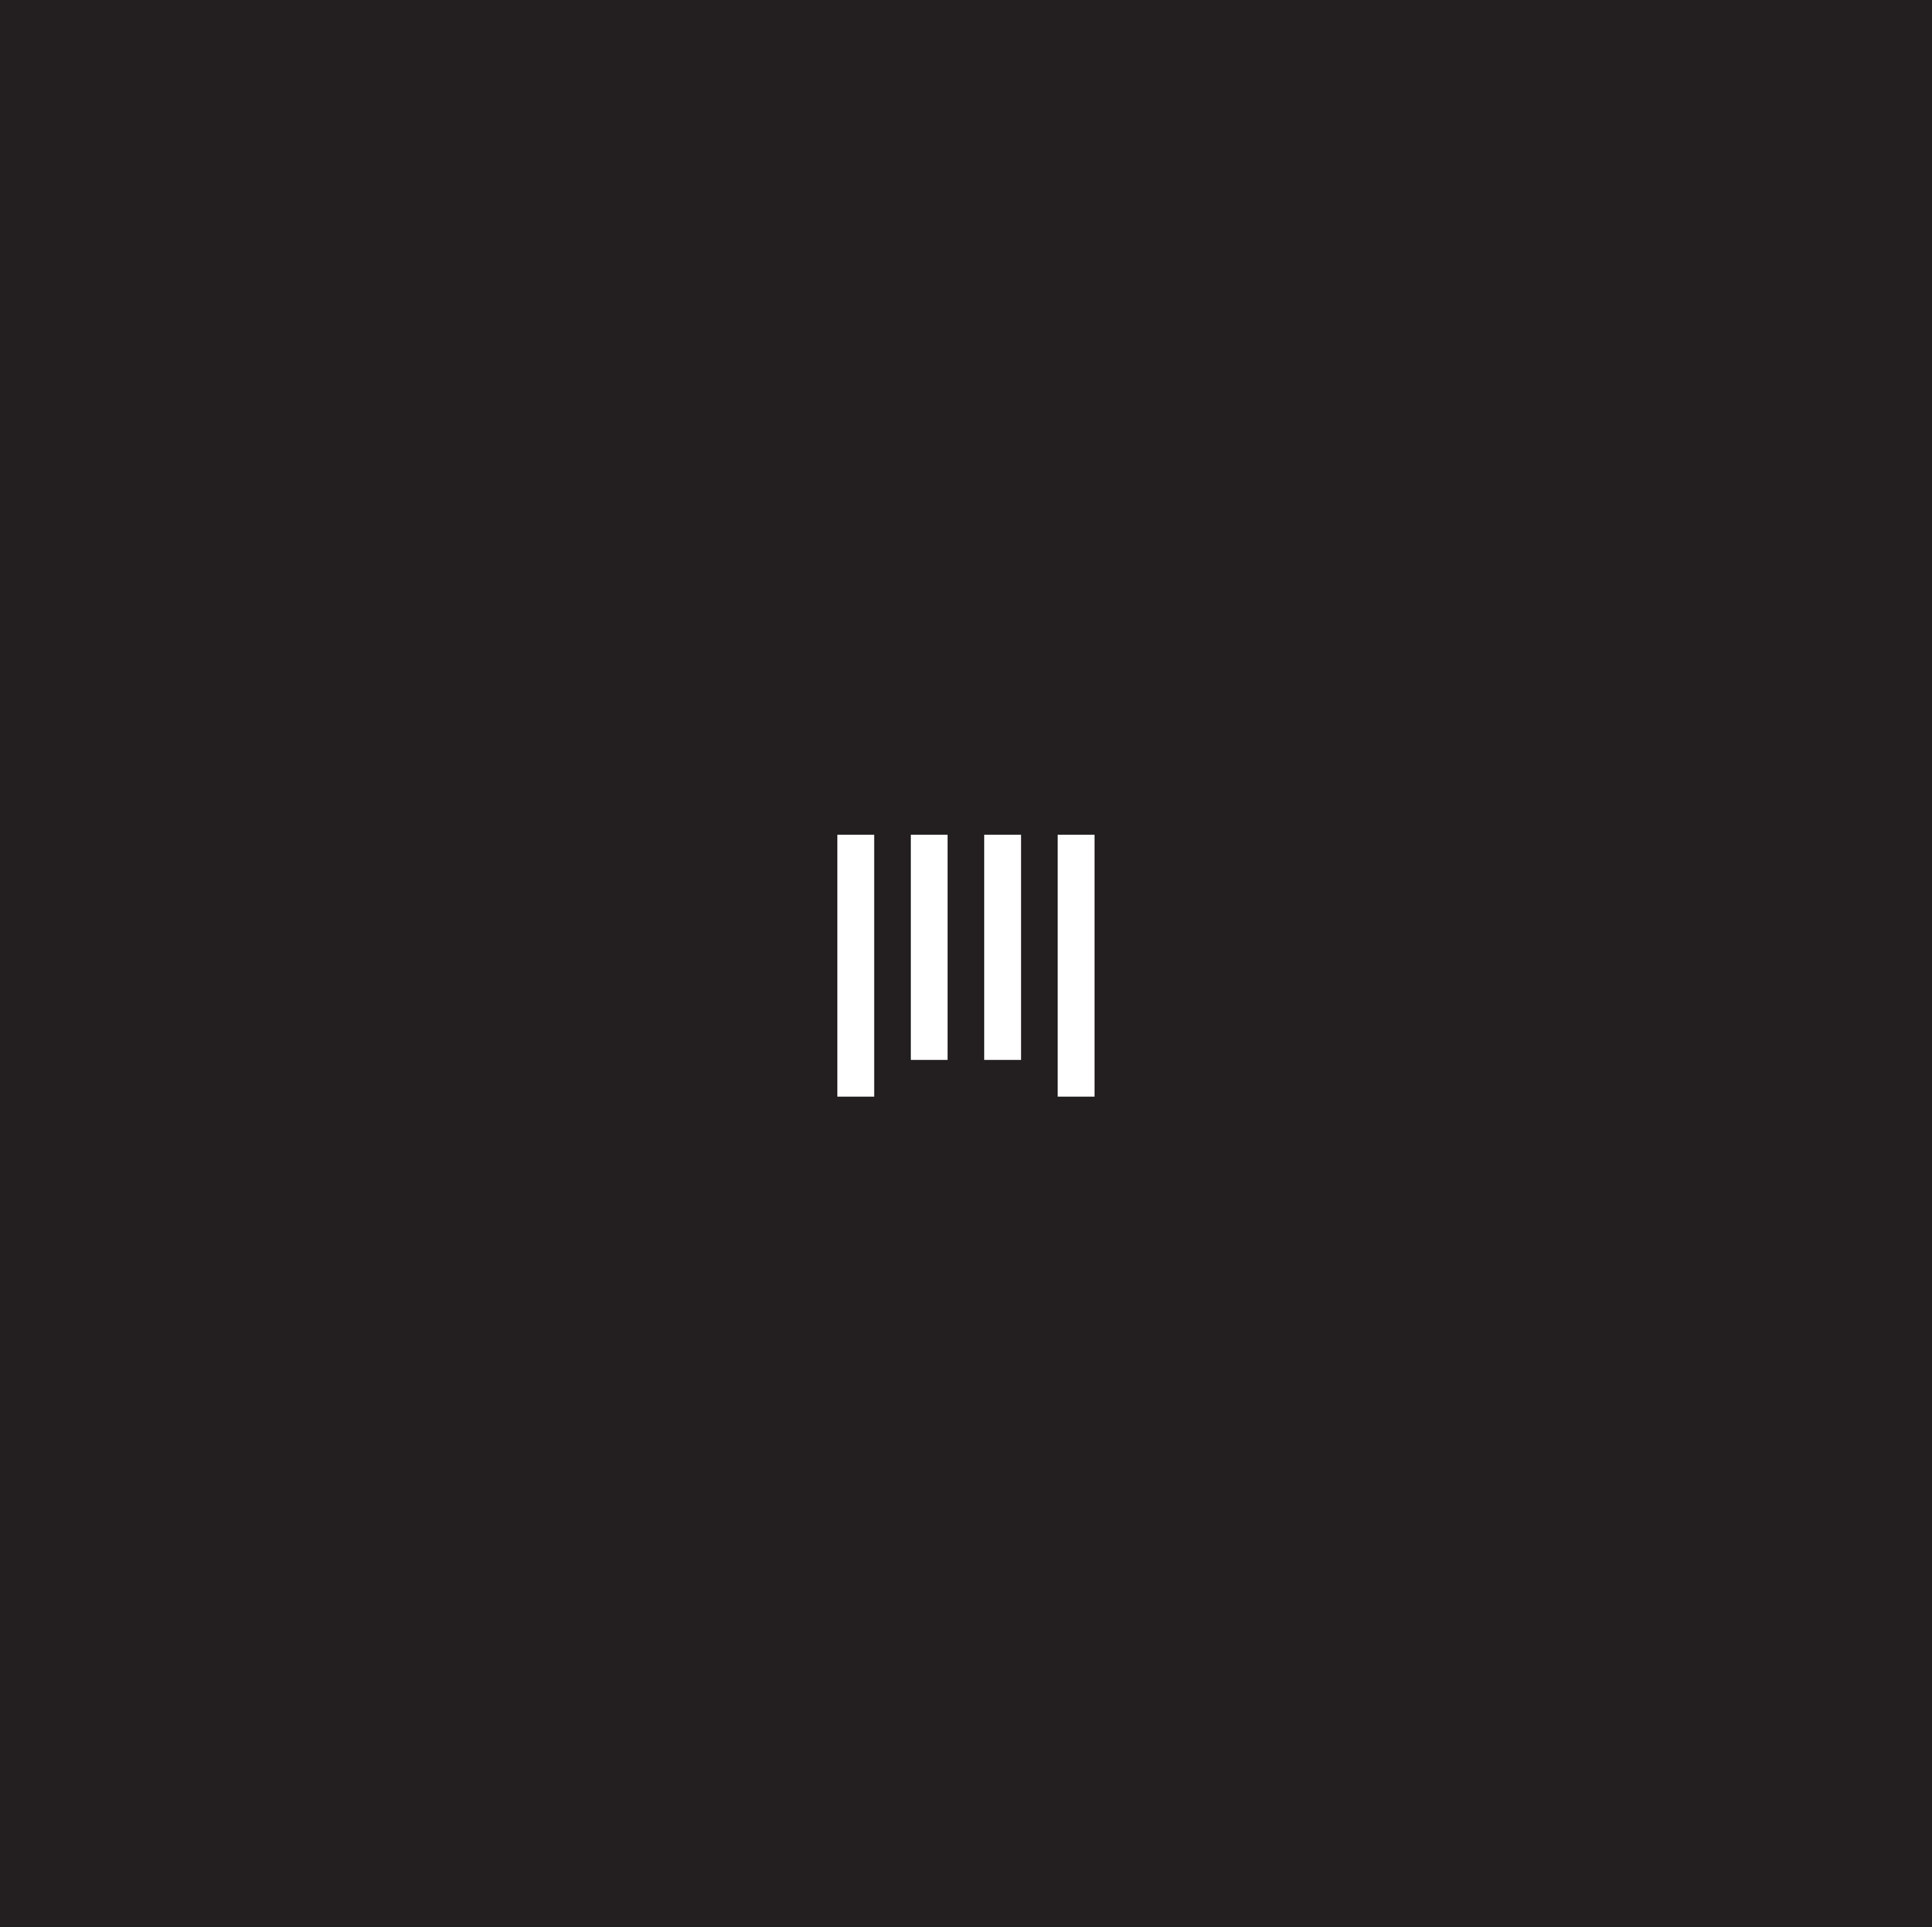 WARP - I need a corp logo